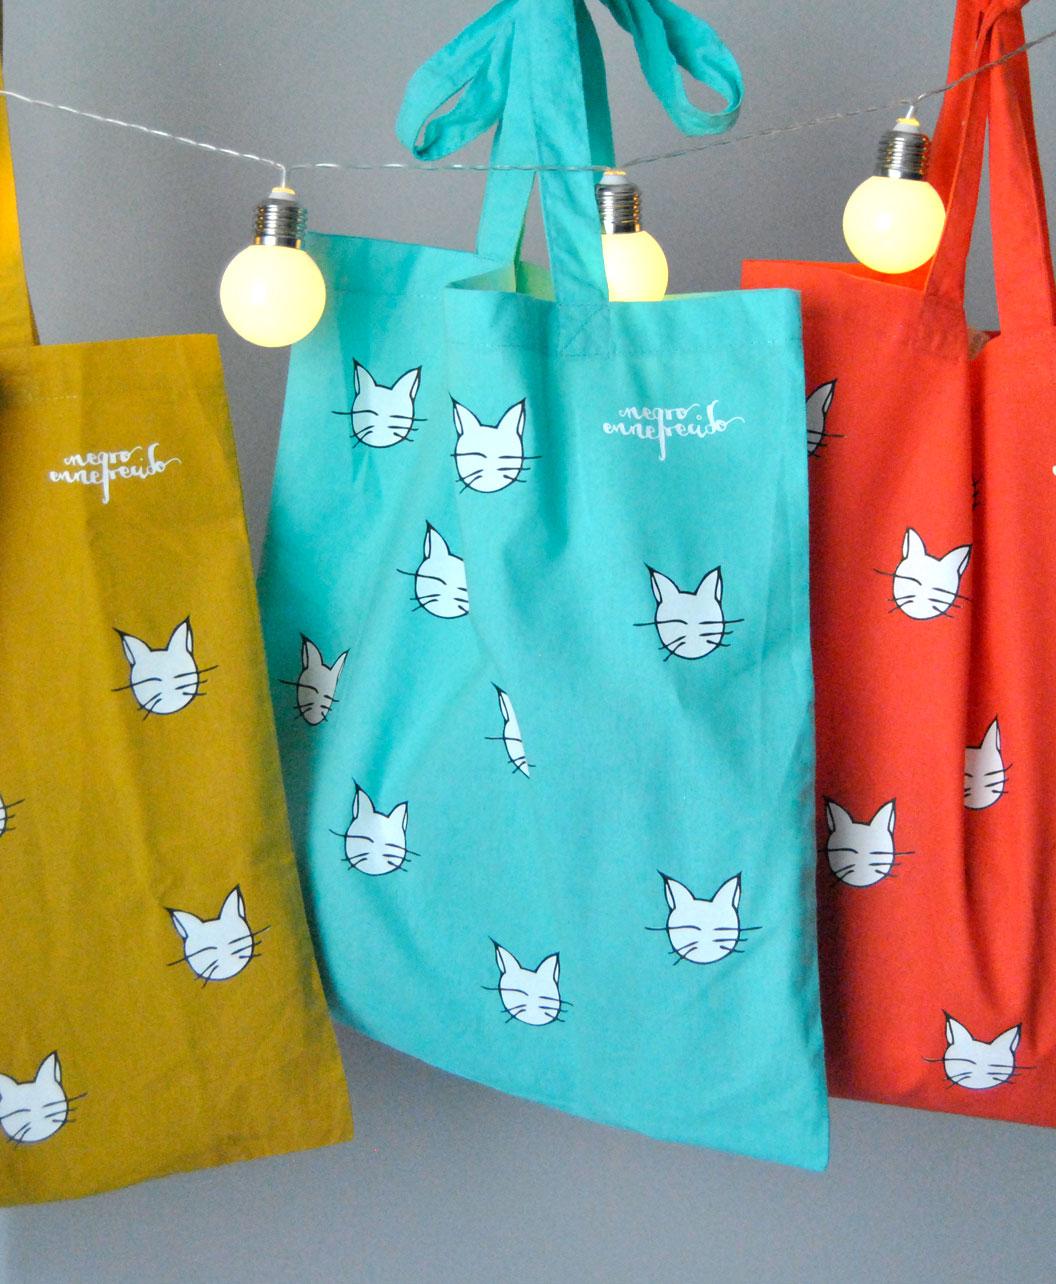 tote bags colores alegres divertidos diferentes gatos